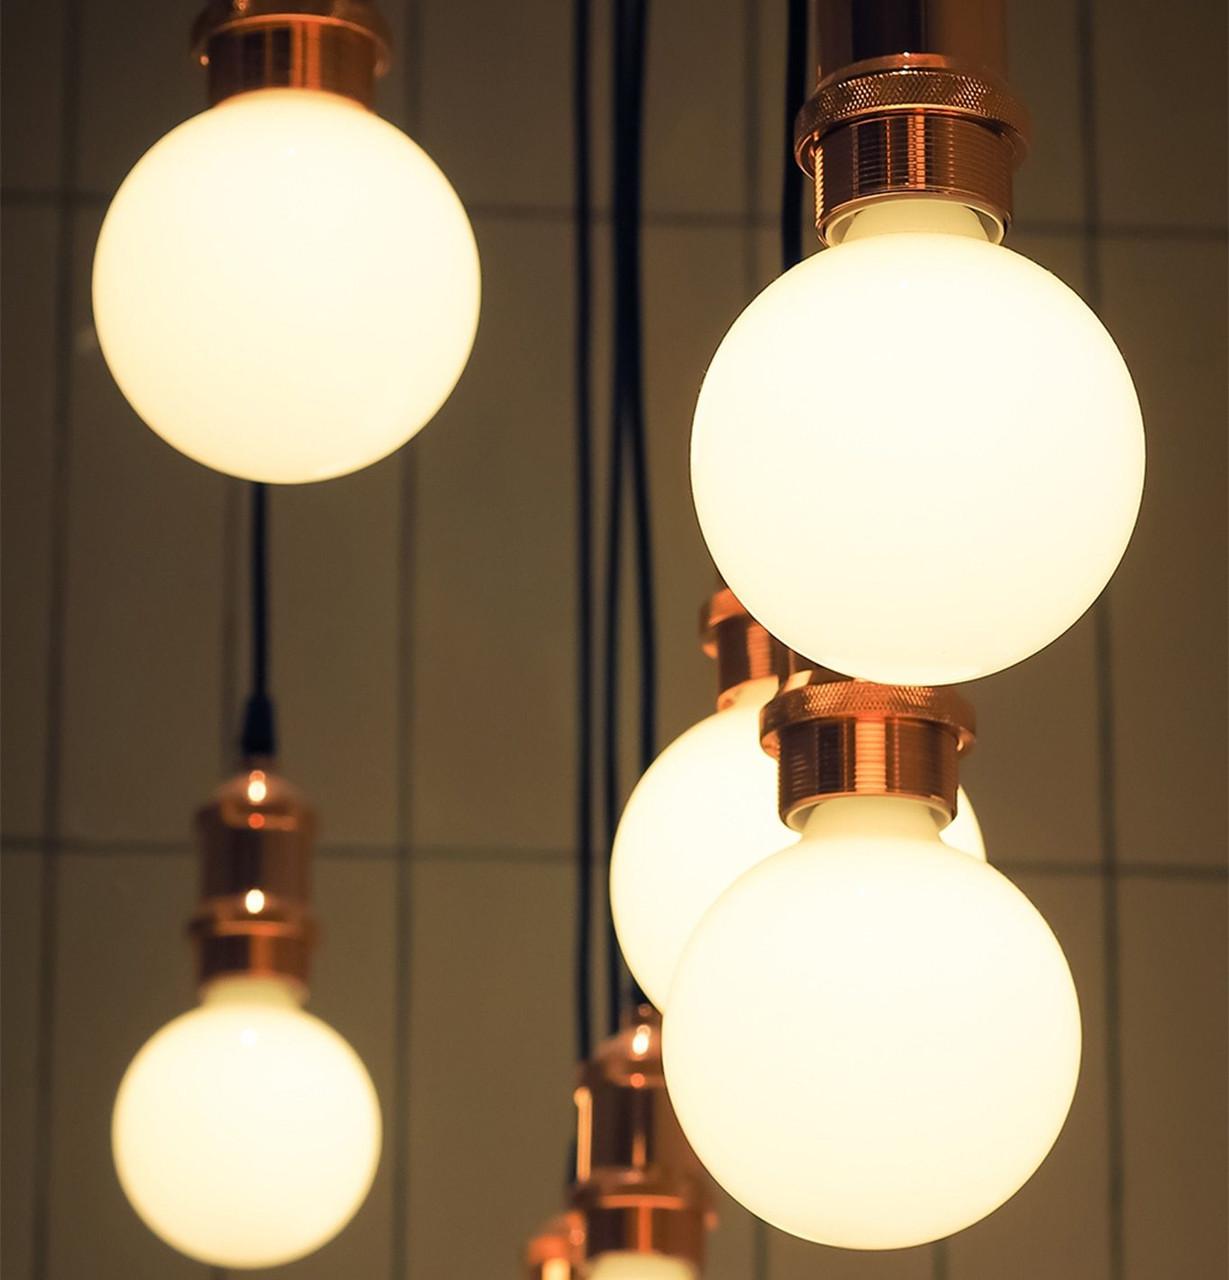 LED Globe Pearl Light Bulbs